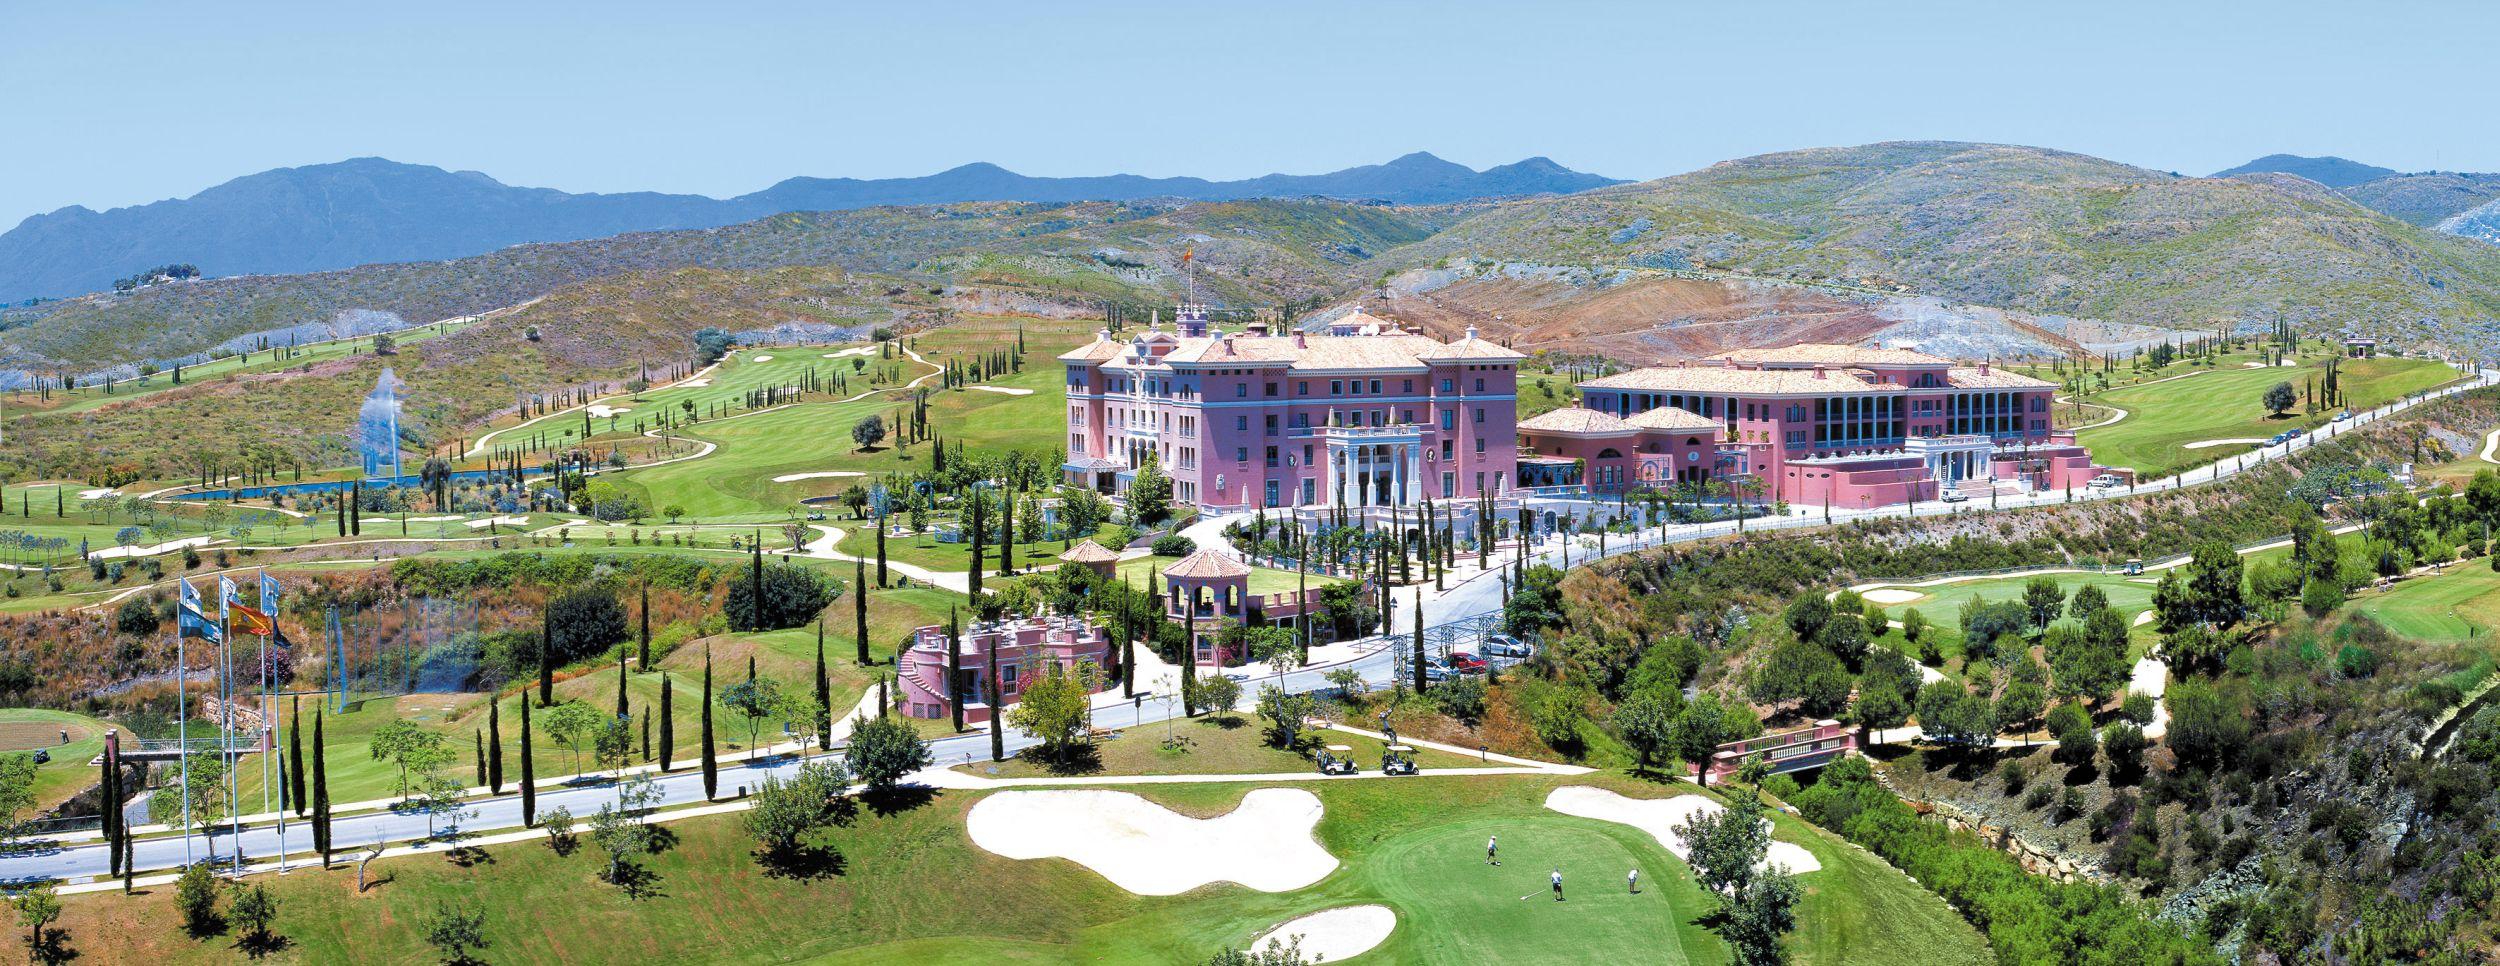 golf-expedition-golfreizen-spanje-heerlijk-golfen-mooiste-golfbanen